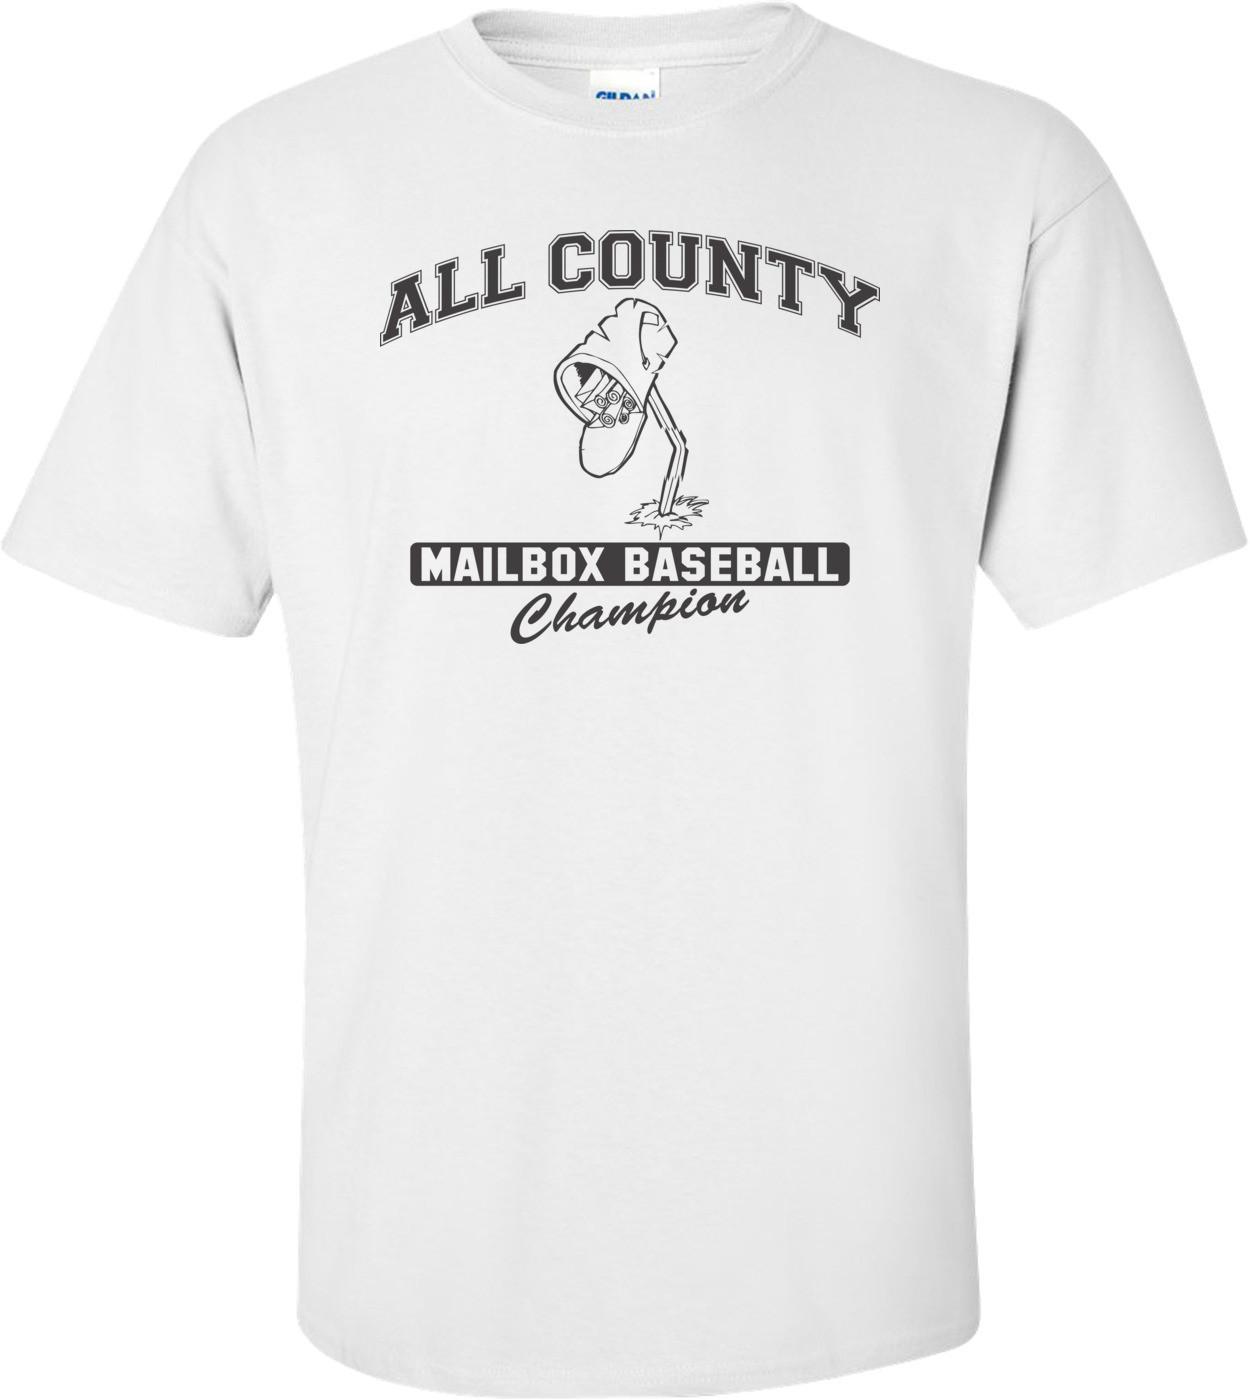 All County Mailbox Baseball Champion